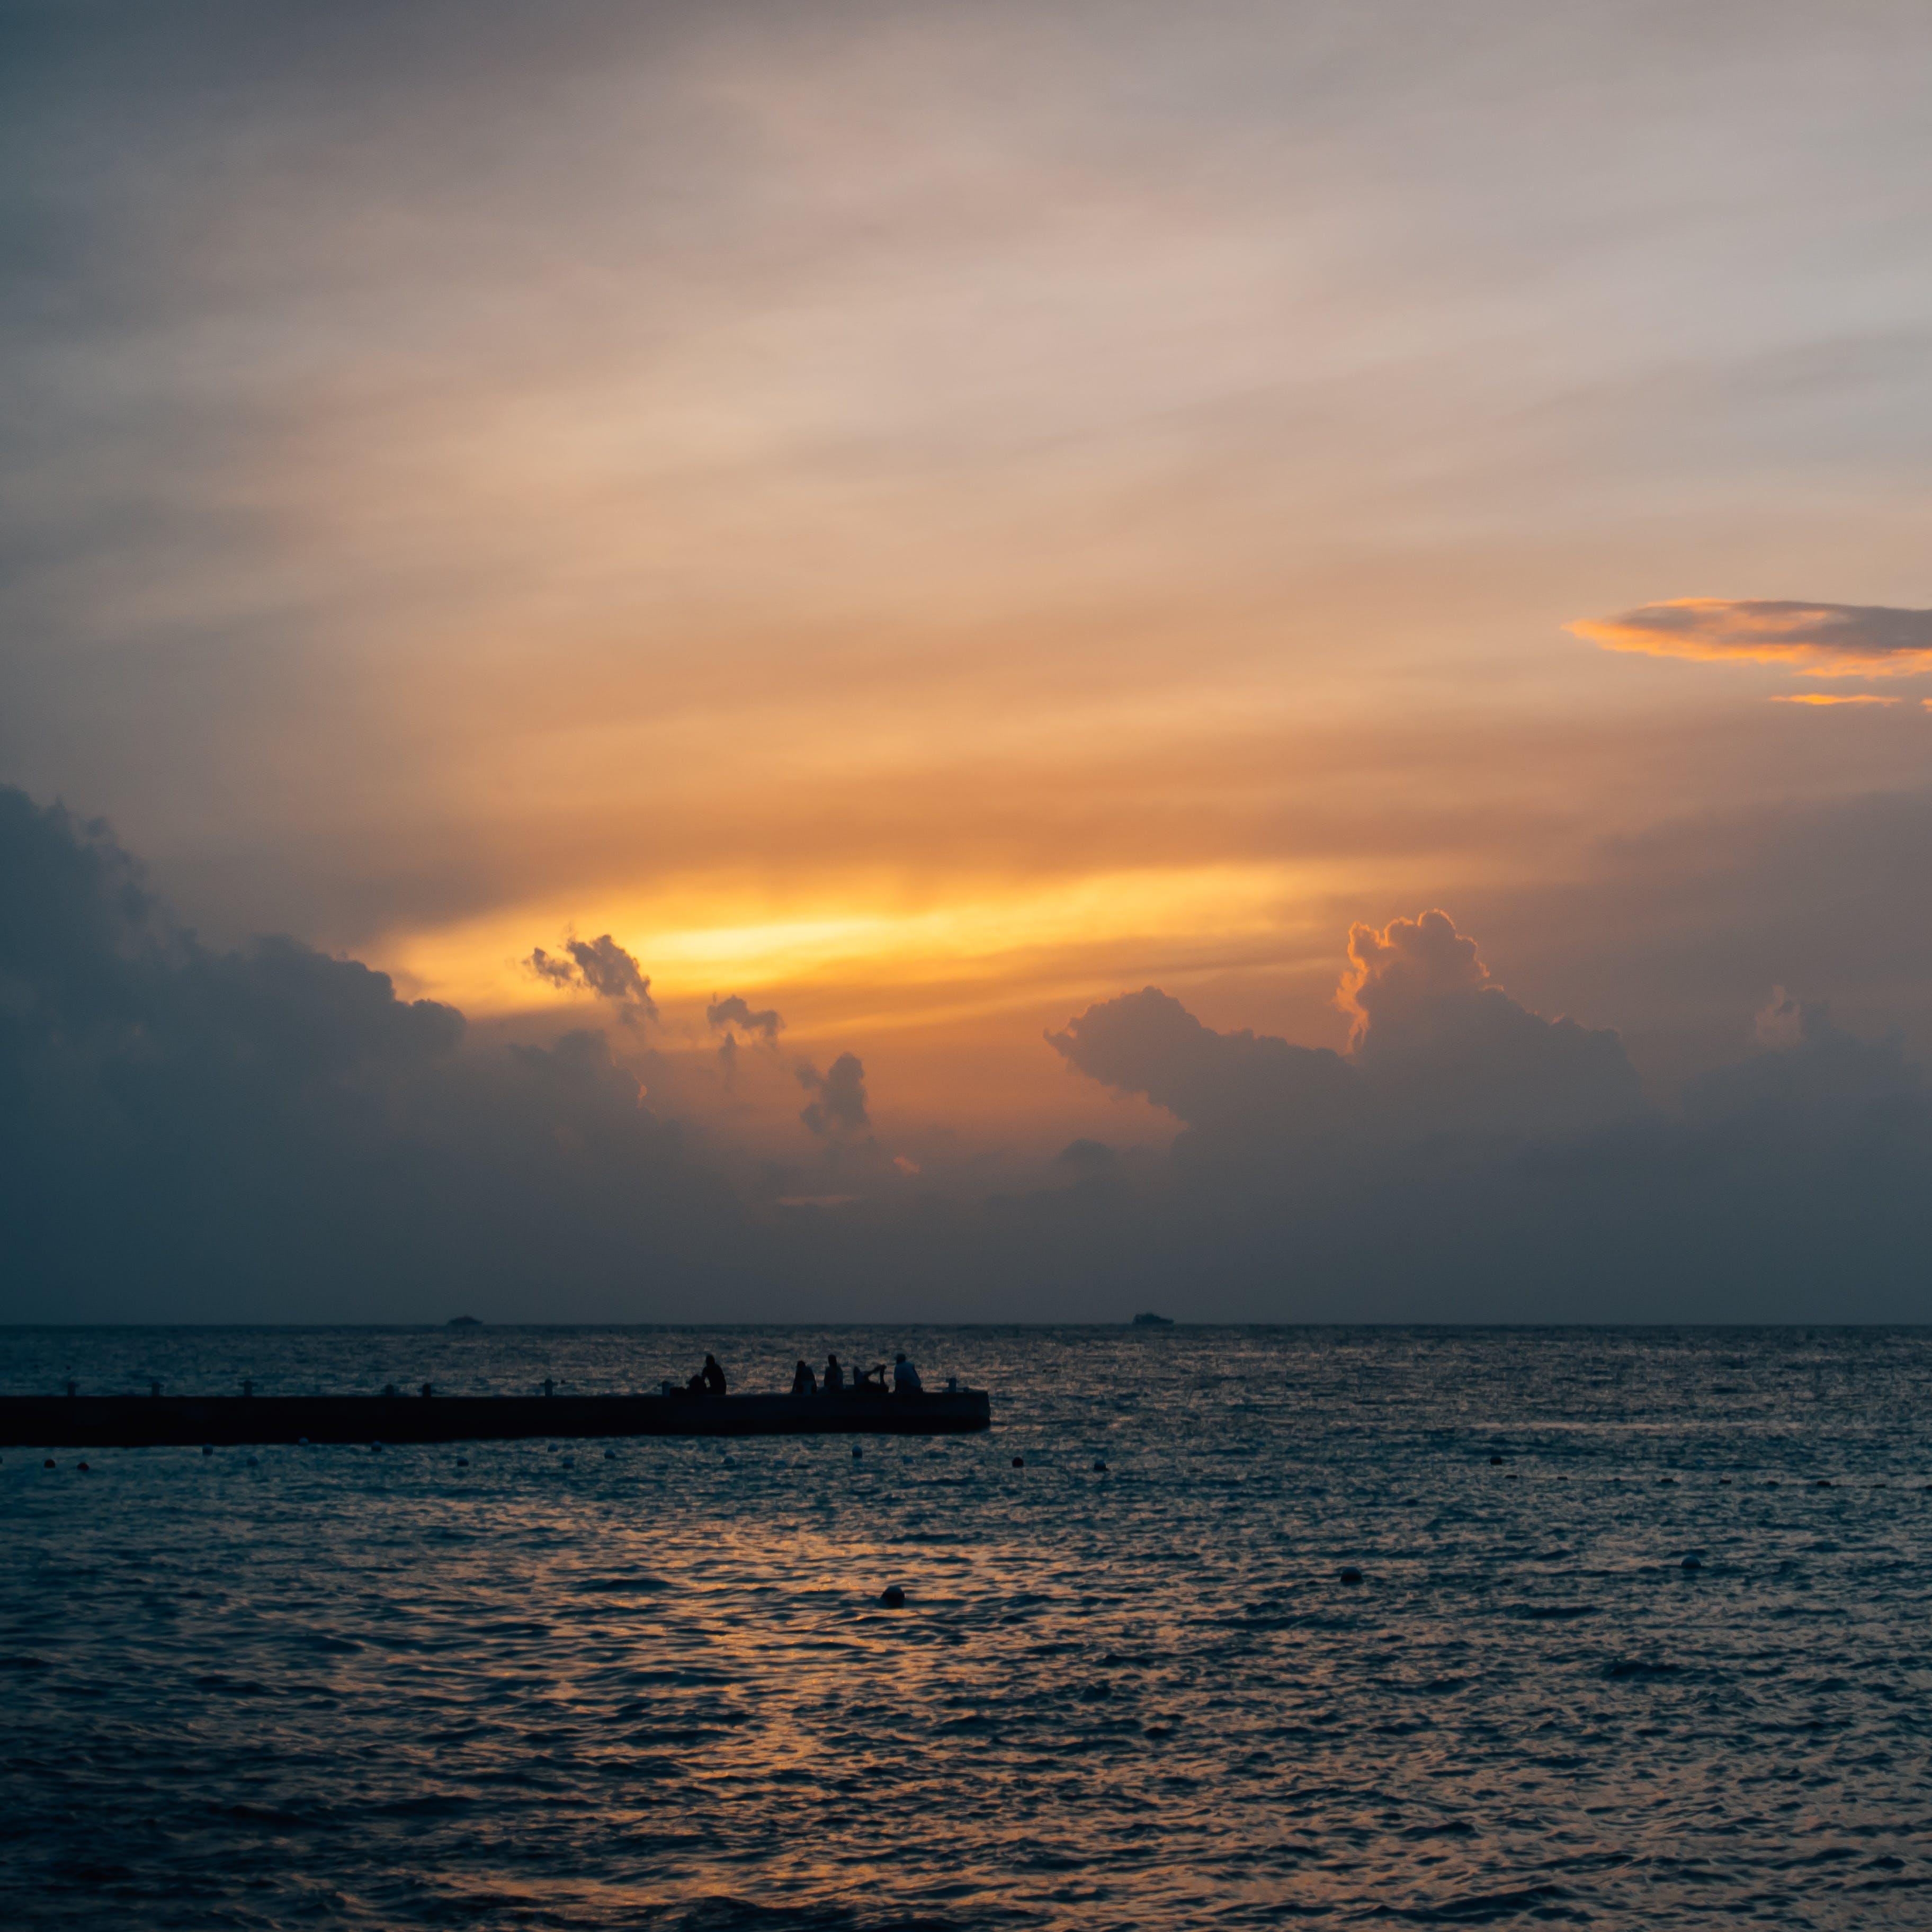 Kostenloses Stock Foto zu dämmerung, himmel, hinterleuchtet, meer